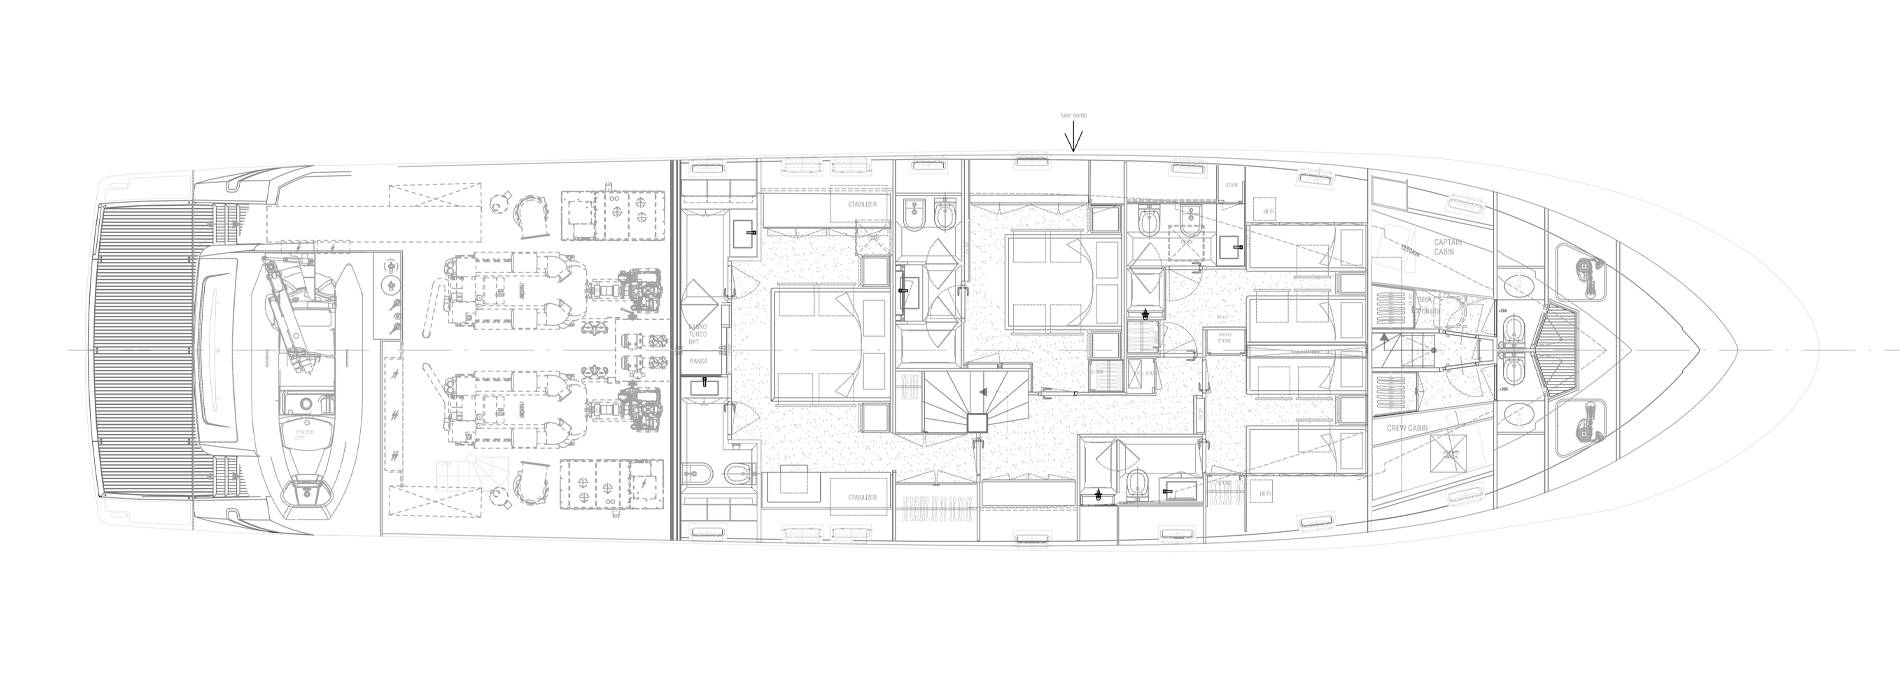 Sanlorenzo Yachts SL96-631 Lower Deck